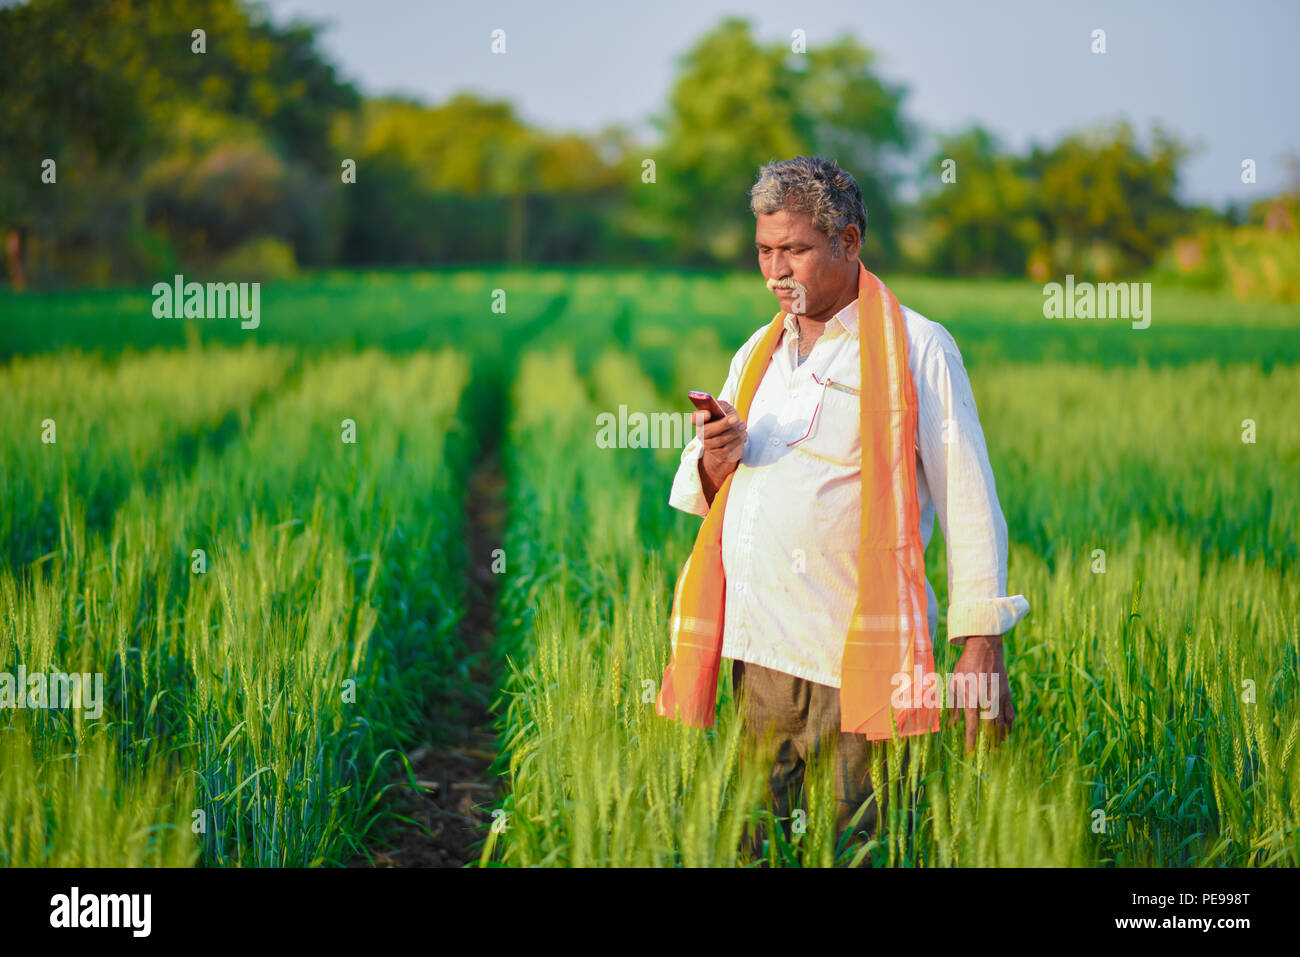 Farmers India With Technology Stock Photos & Farmers India